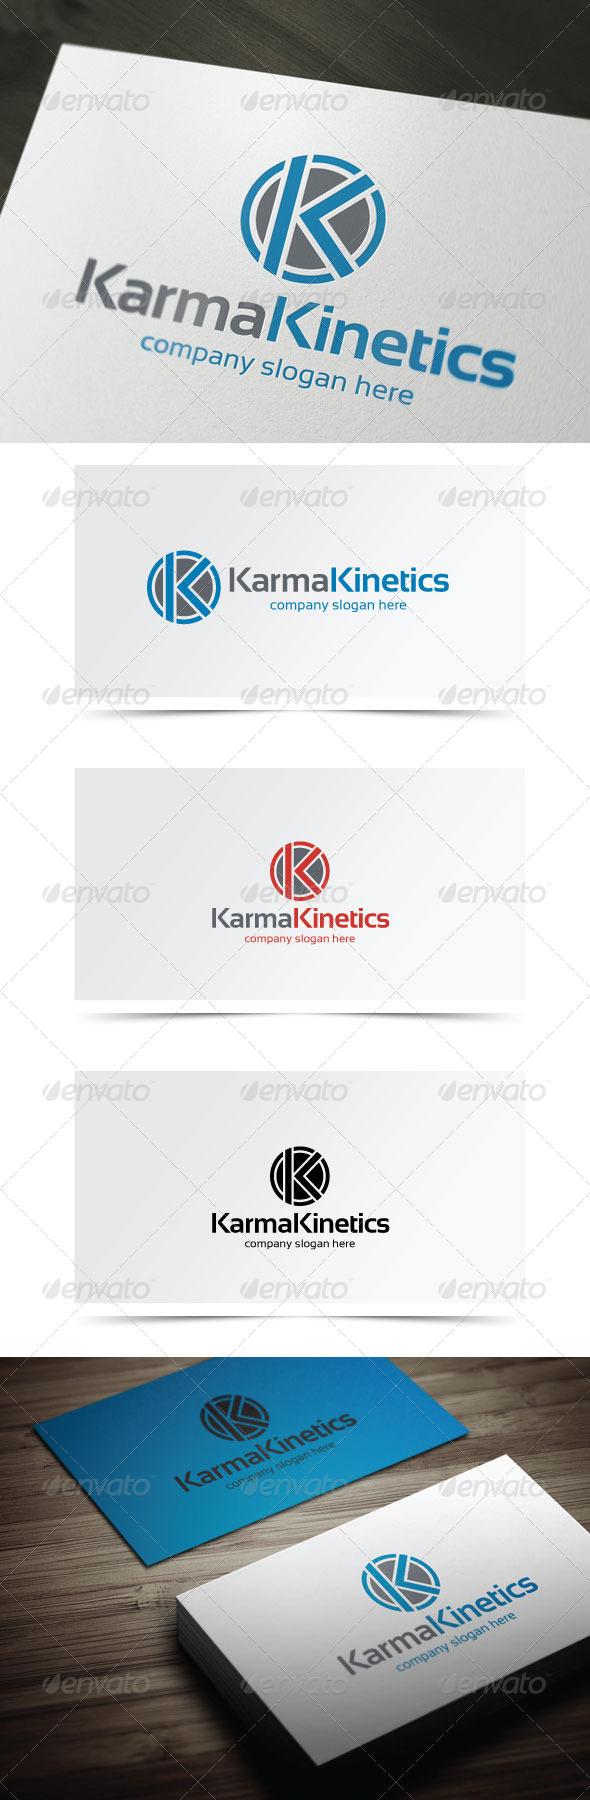 Karma Kinetics